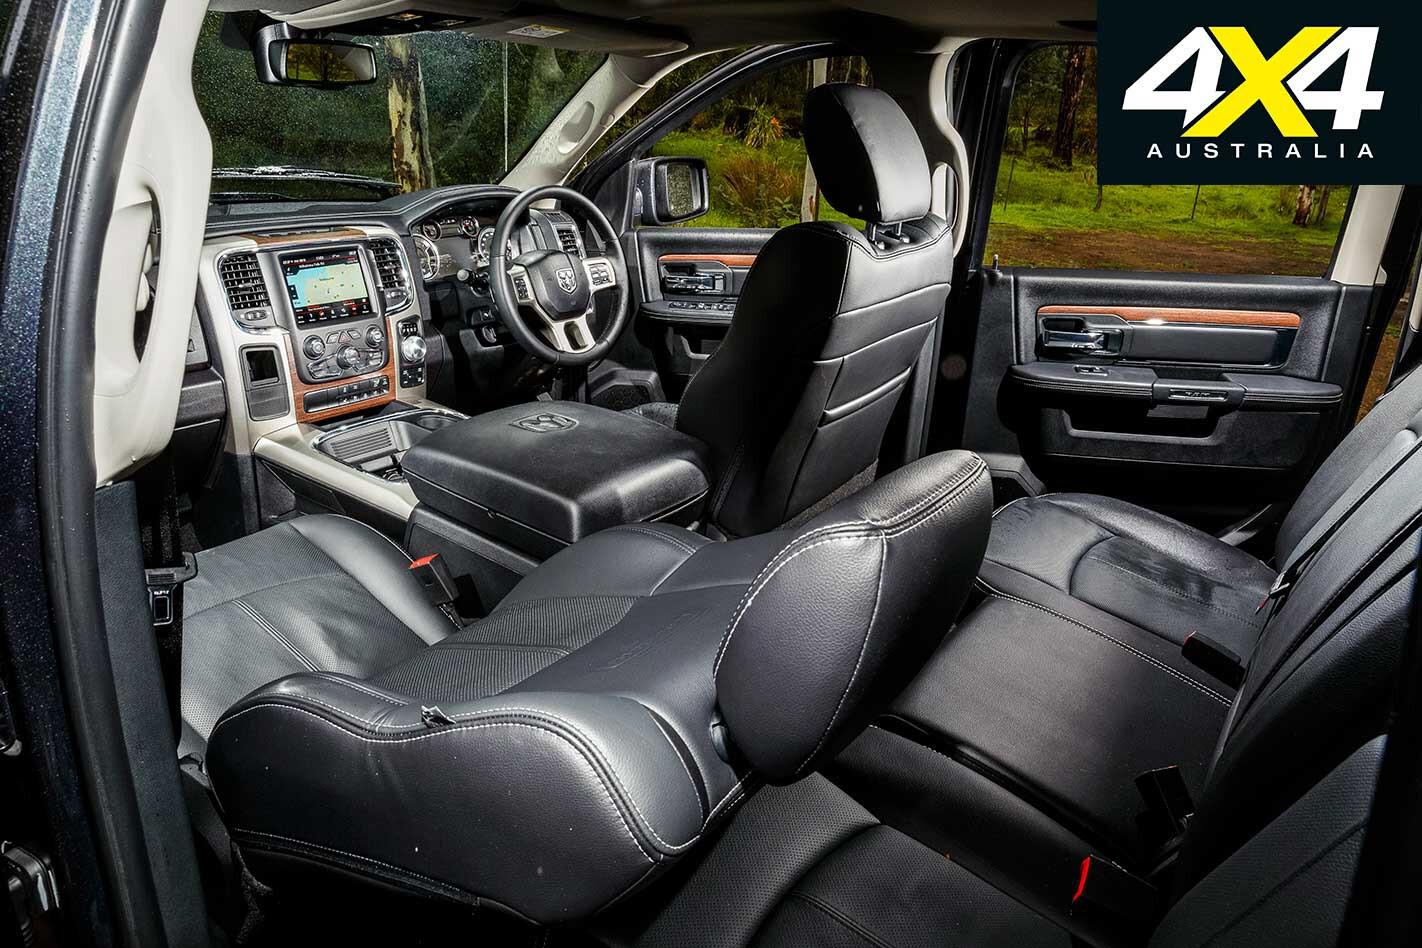 2018 RAM 1500 Laramie Interior Jpg